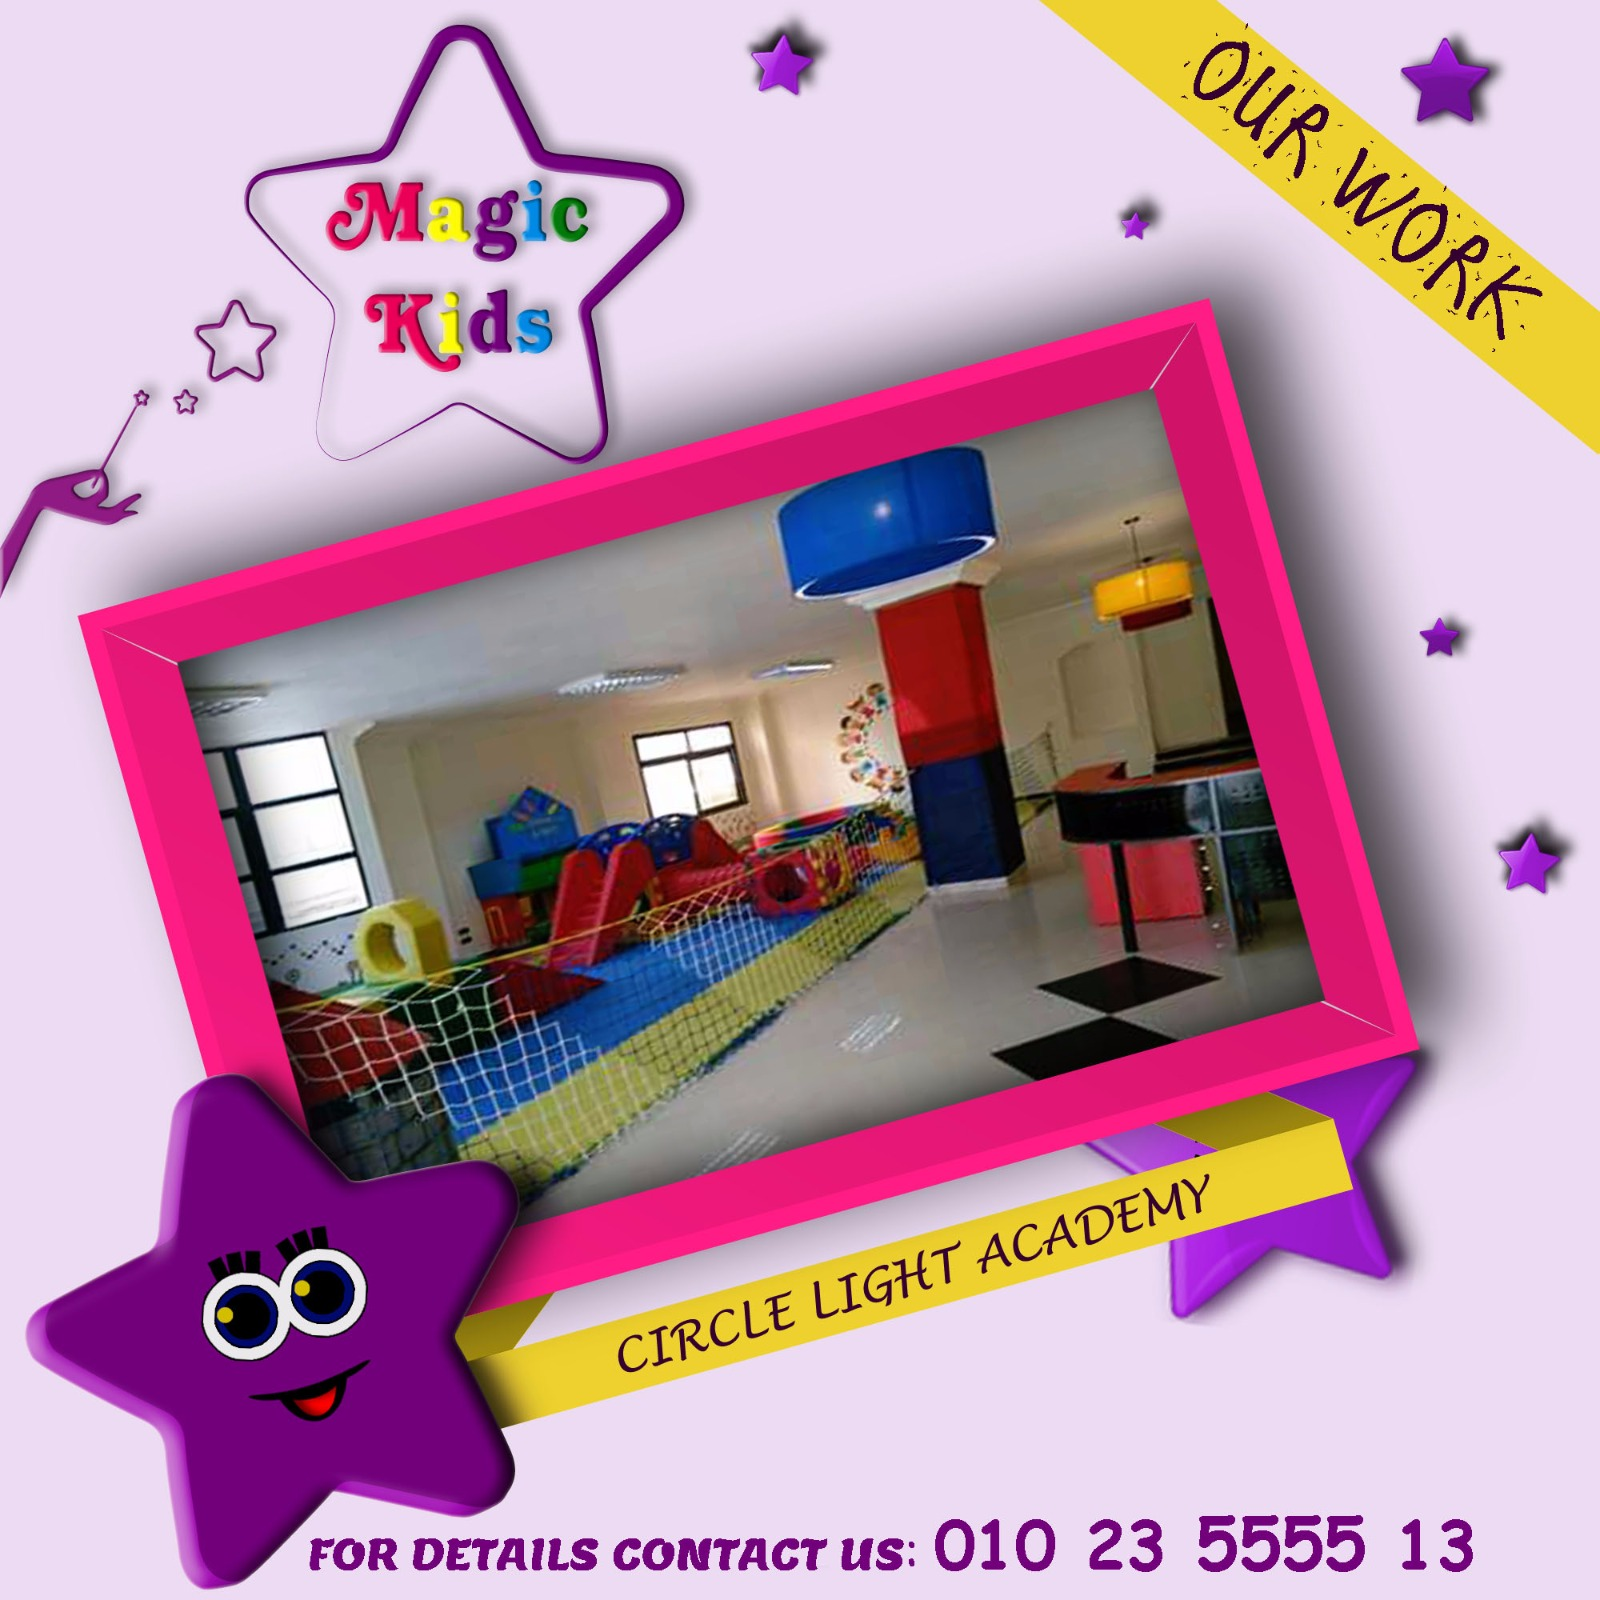 circle light academy